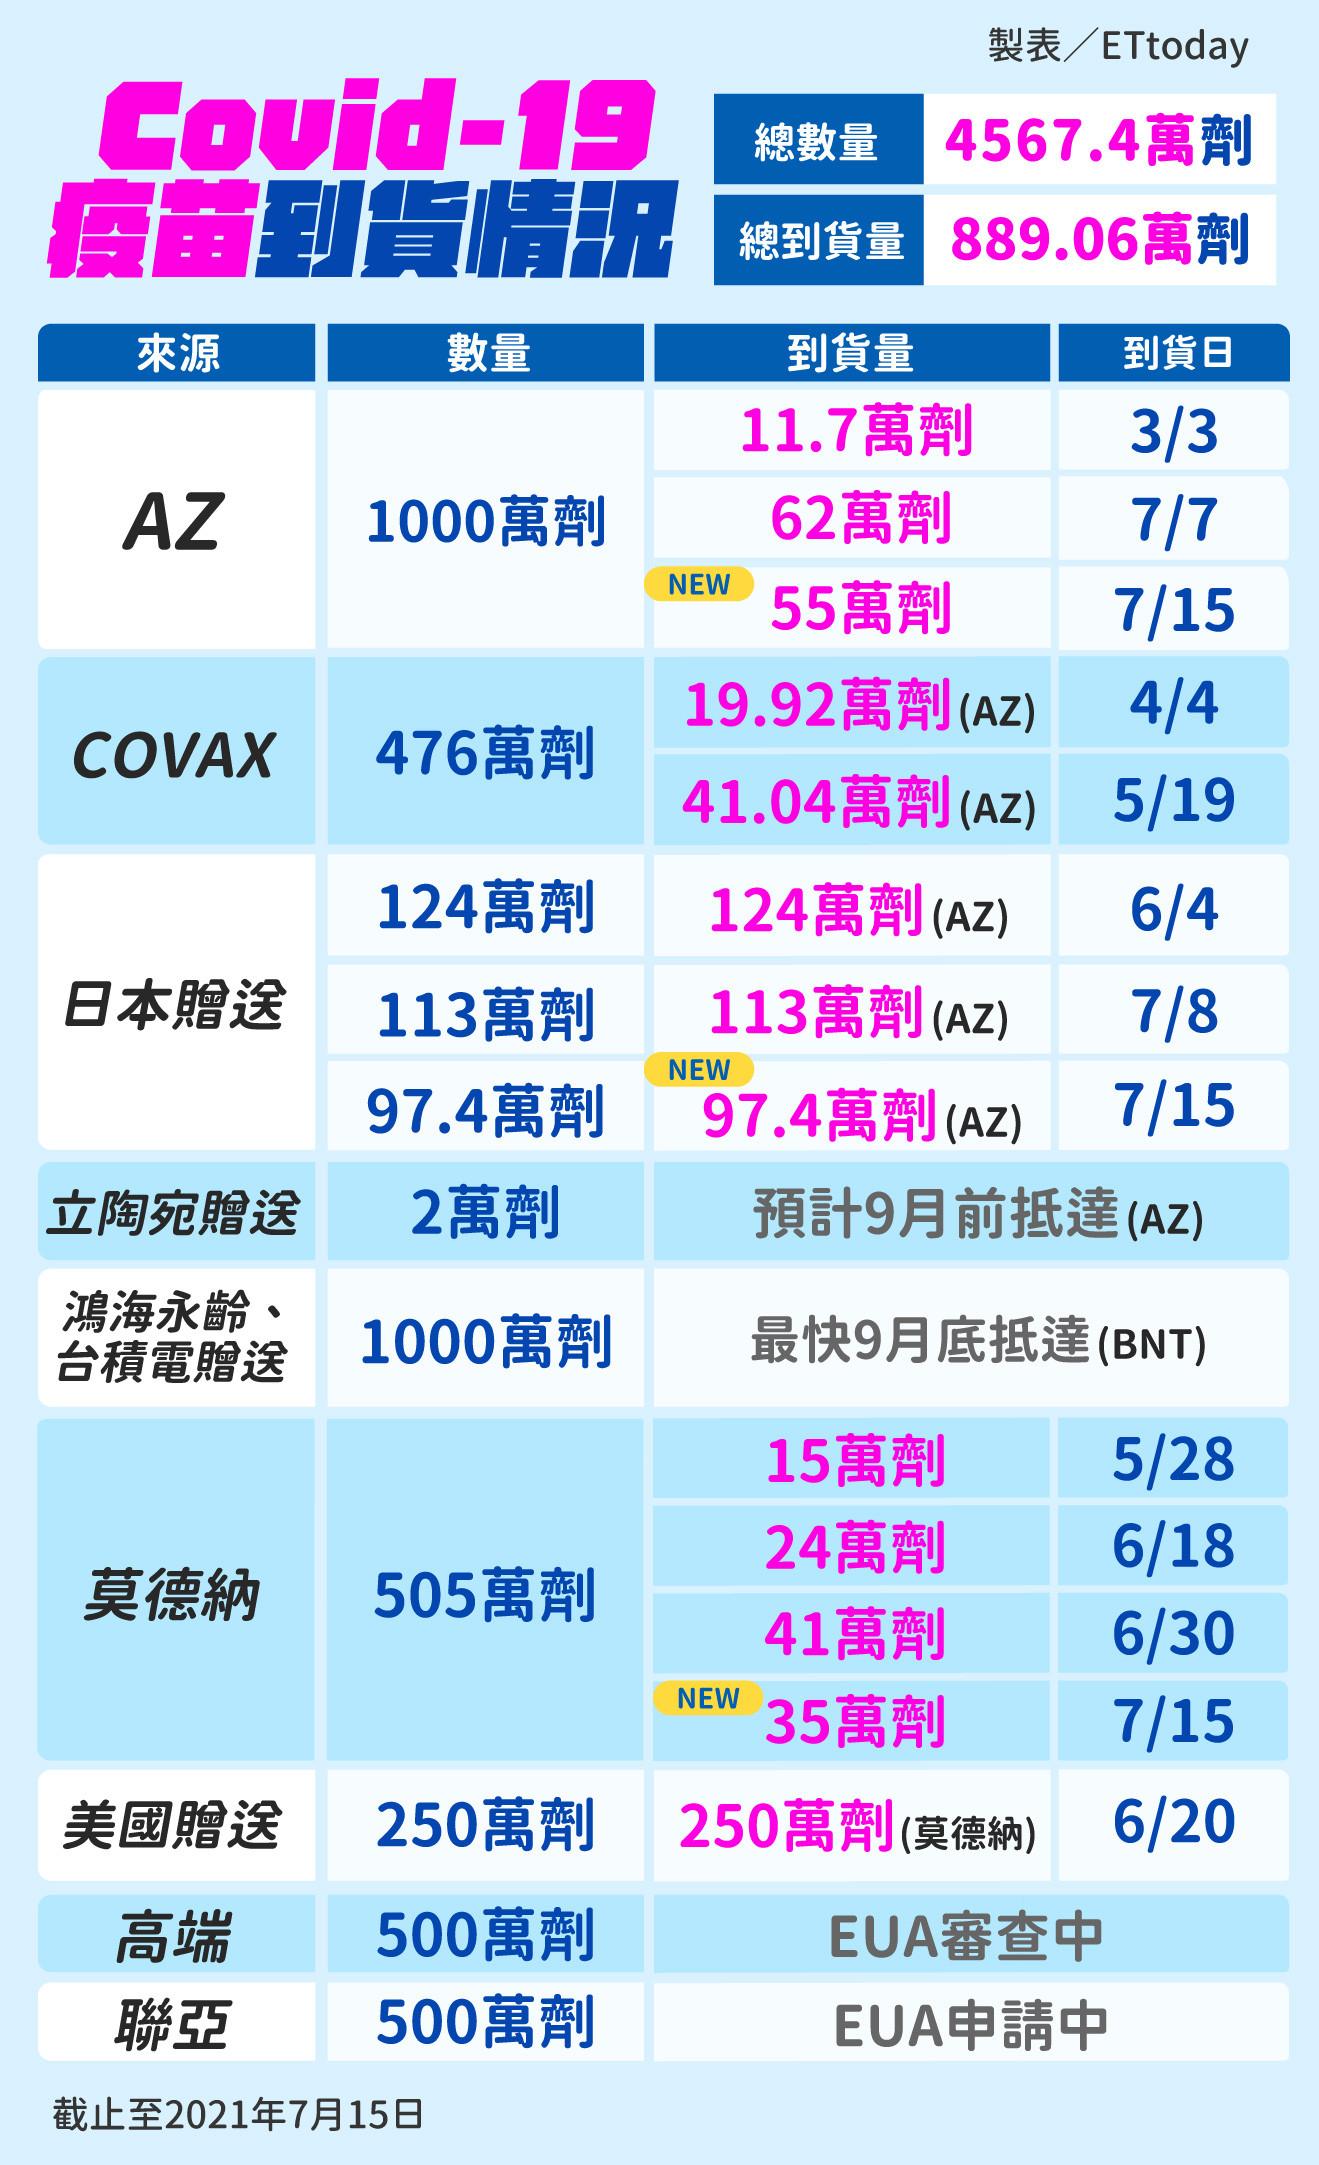 COVID-19,疫情,防疫,後疫情,經濟,入境,普篩,疫調